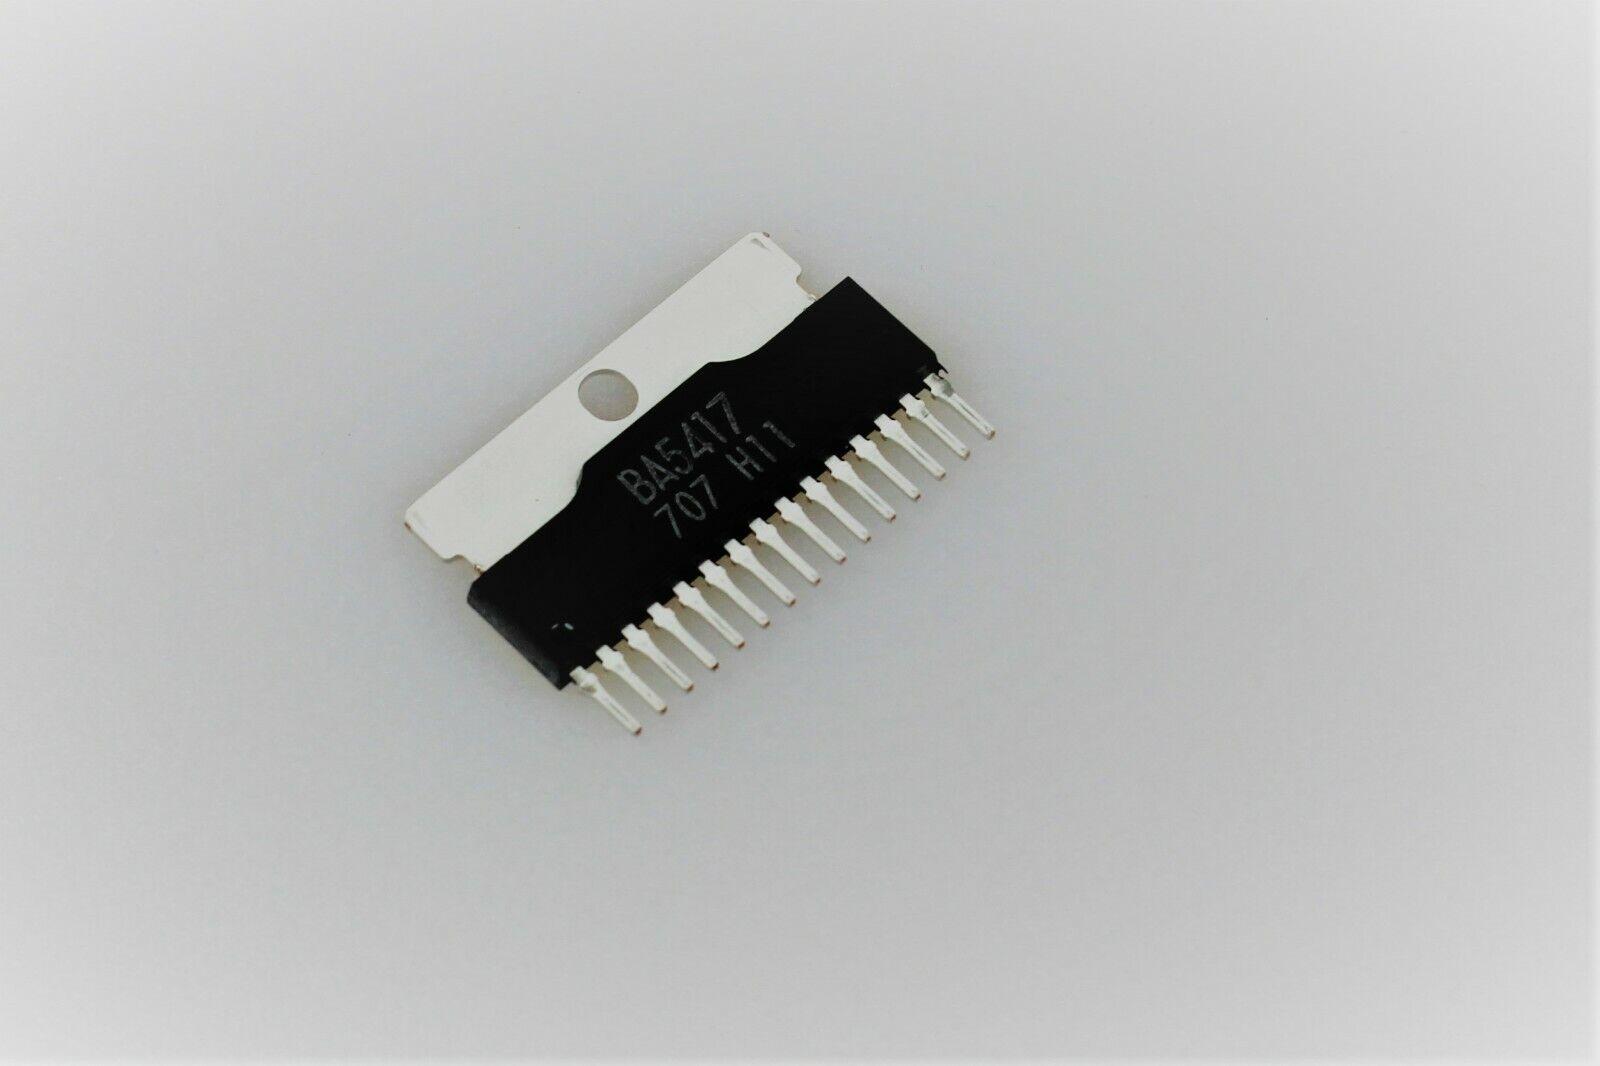 new ba5417 5w 5w 6 15v 15w